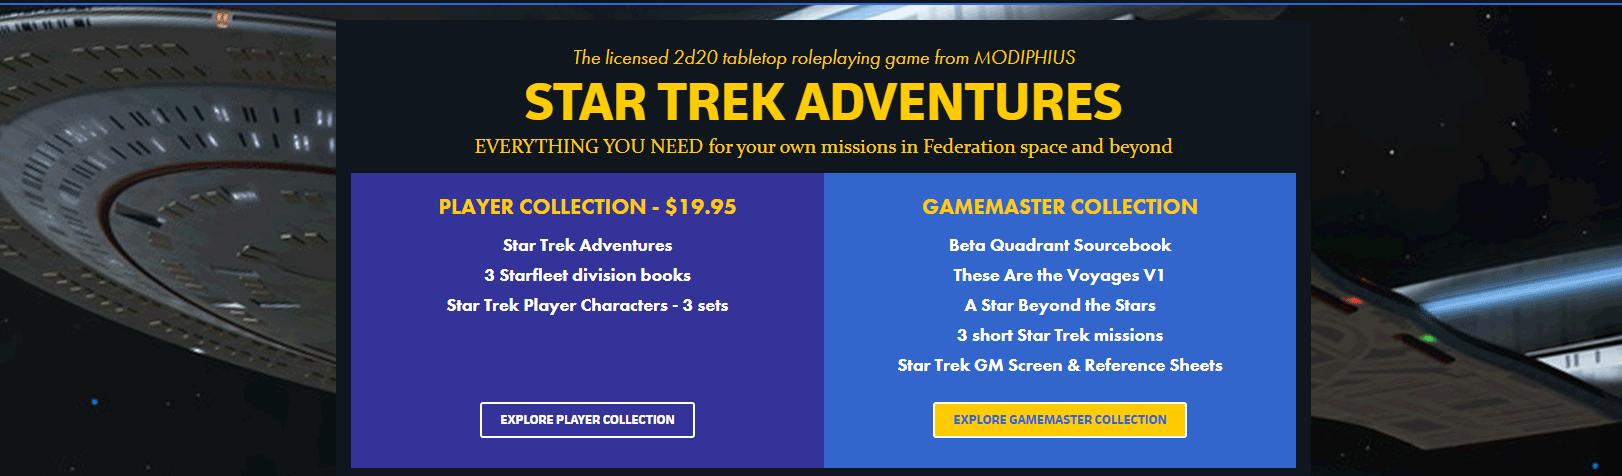 Star Trek Adventures bundle